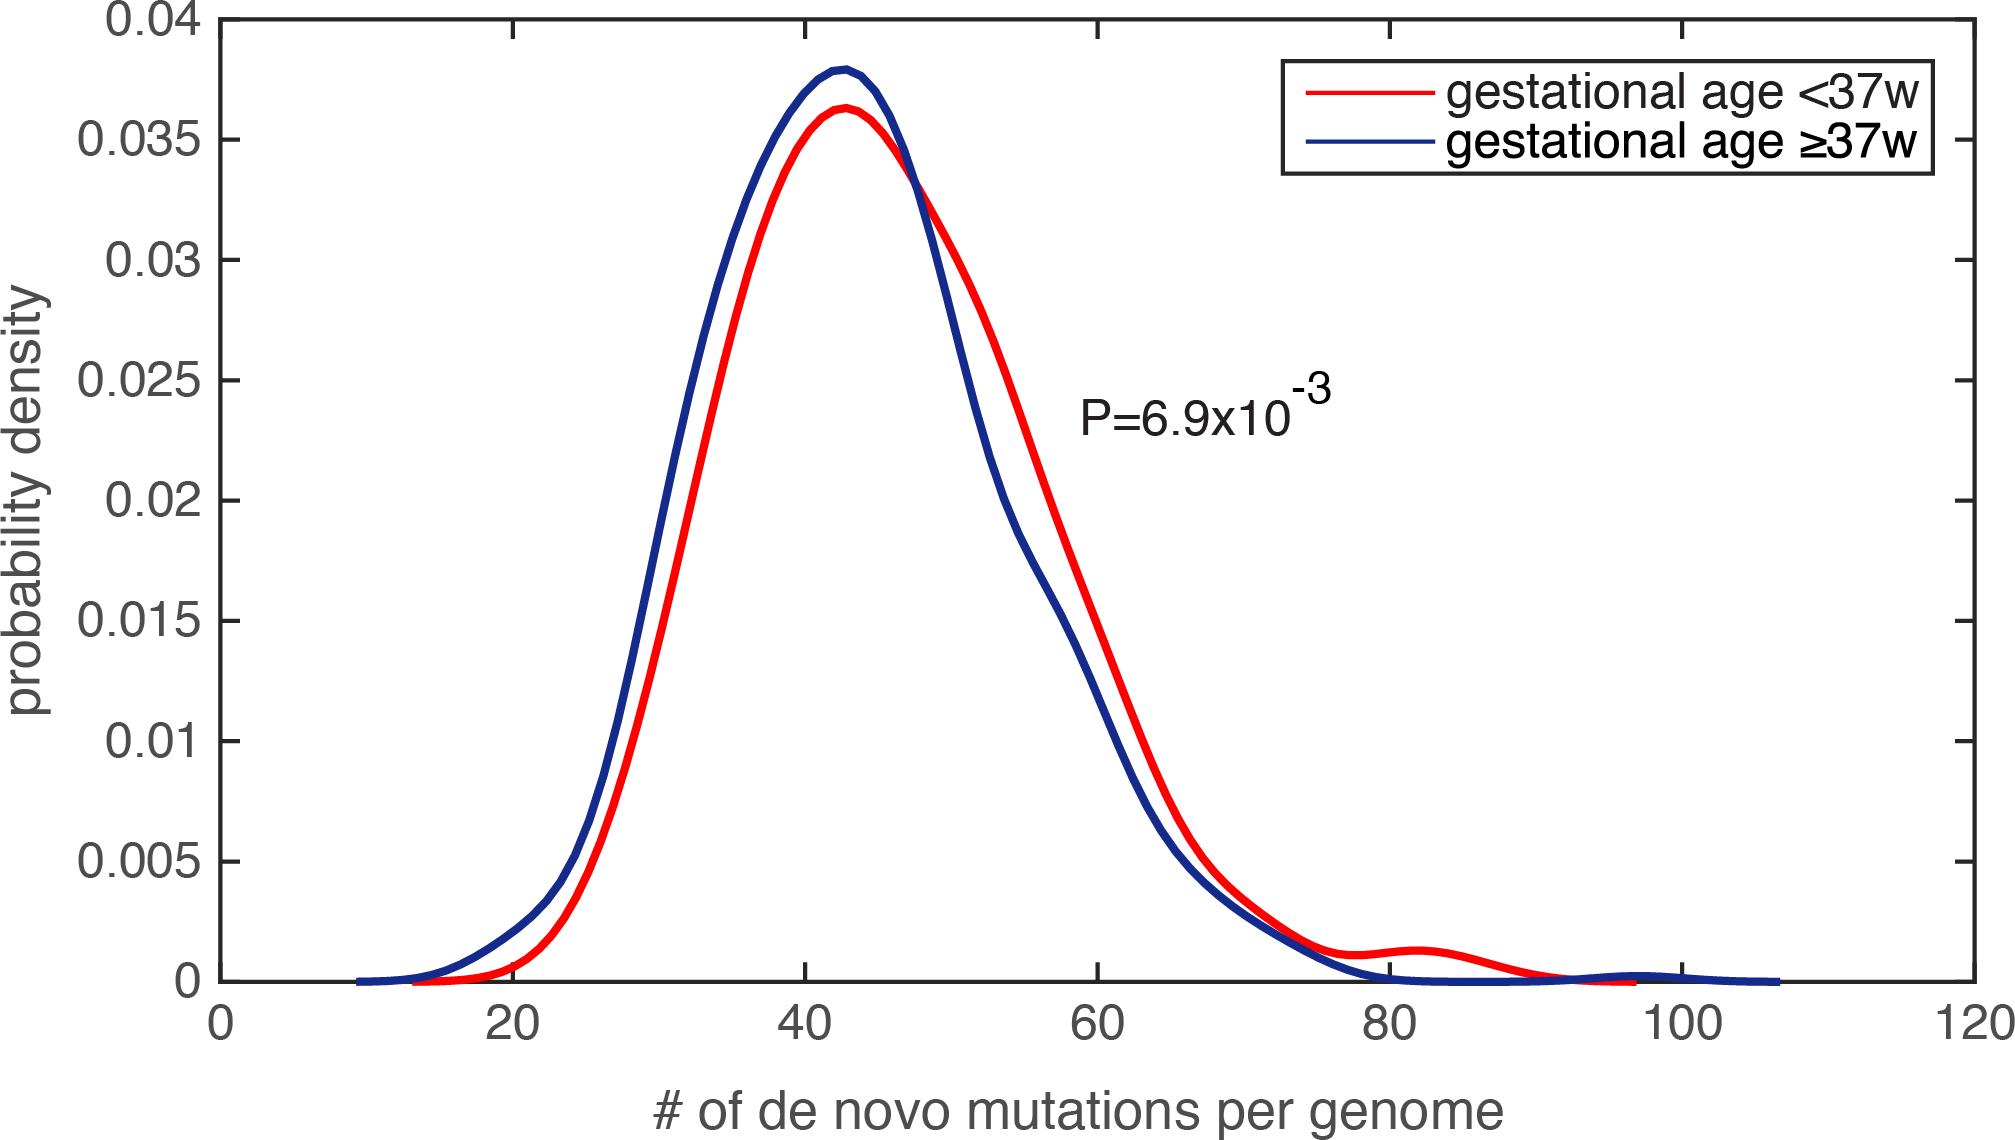 Significantly increased de novo mutation burden in preterm newborn's genomes.